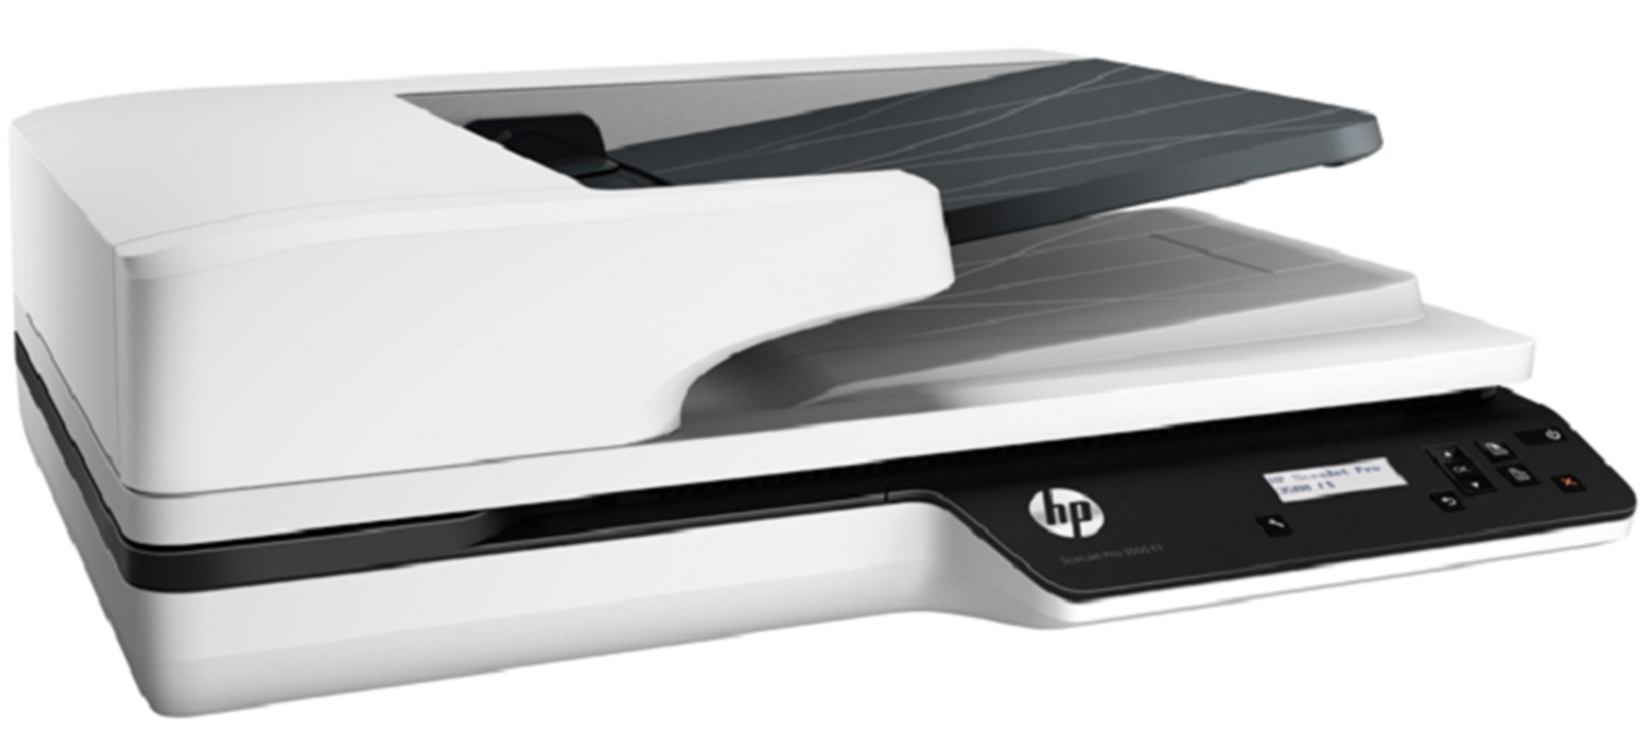 Máy quét HP ScanJet Pro 3500 f1 2